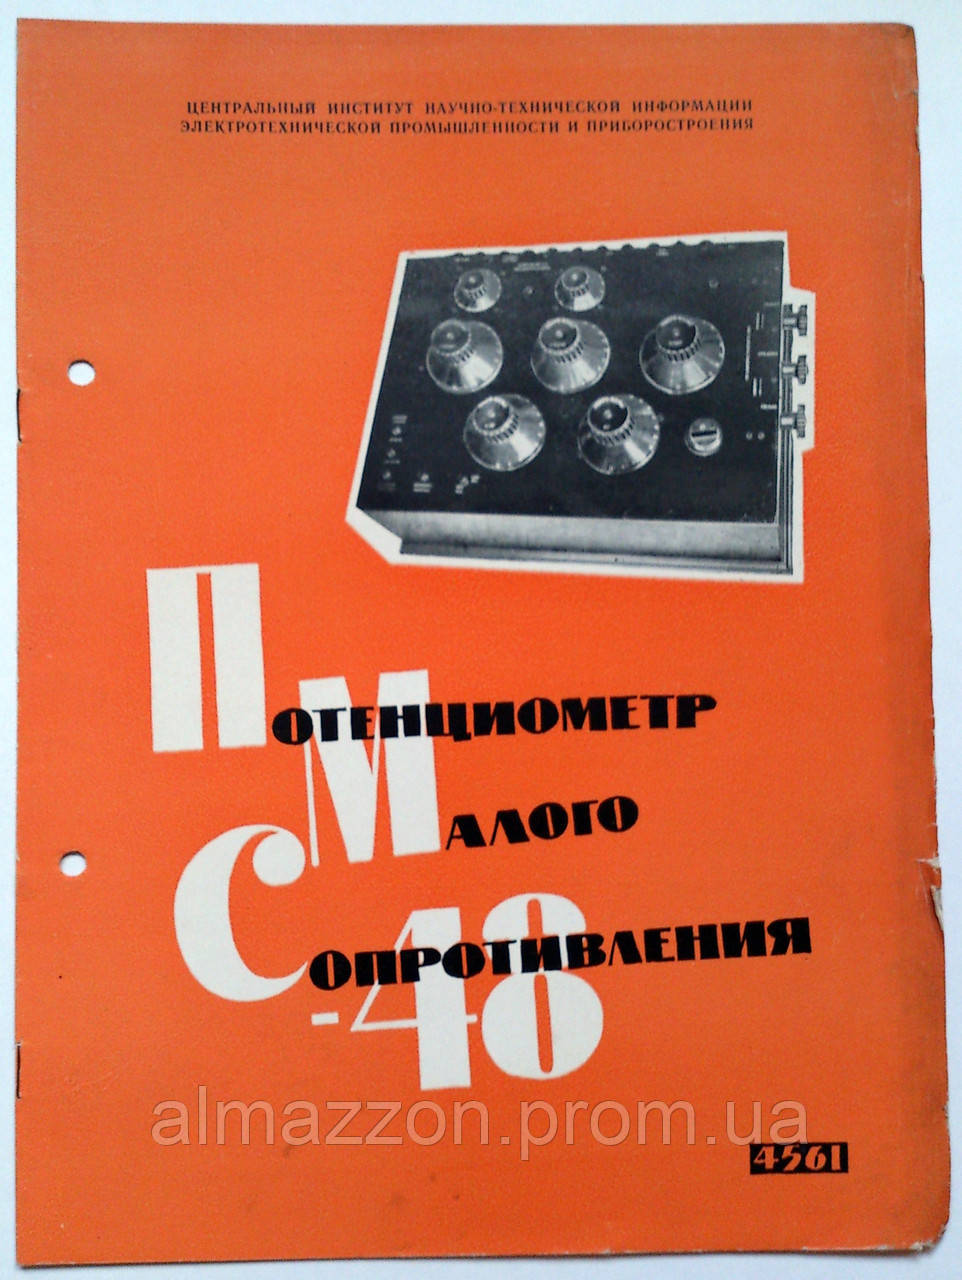 "Журнал (Бюллетень) ЦИНТИ ""Потенциометр малого сопротивления -48"" 1960 год"